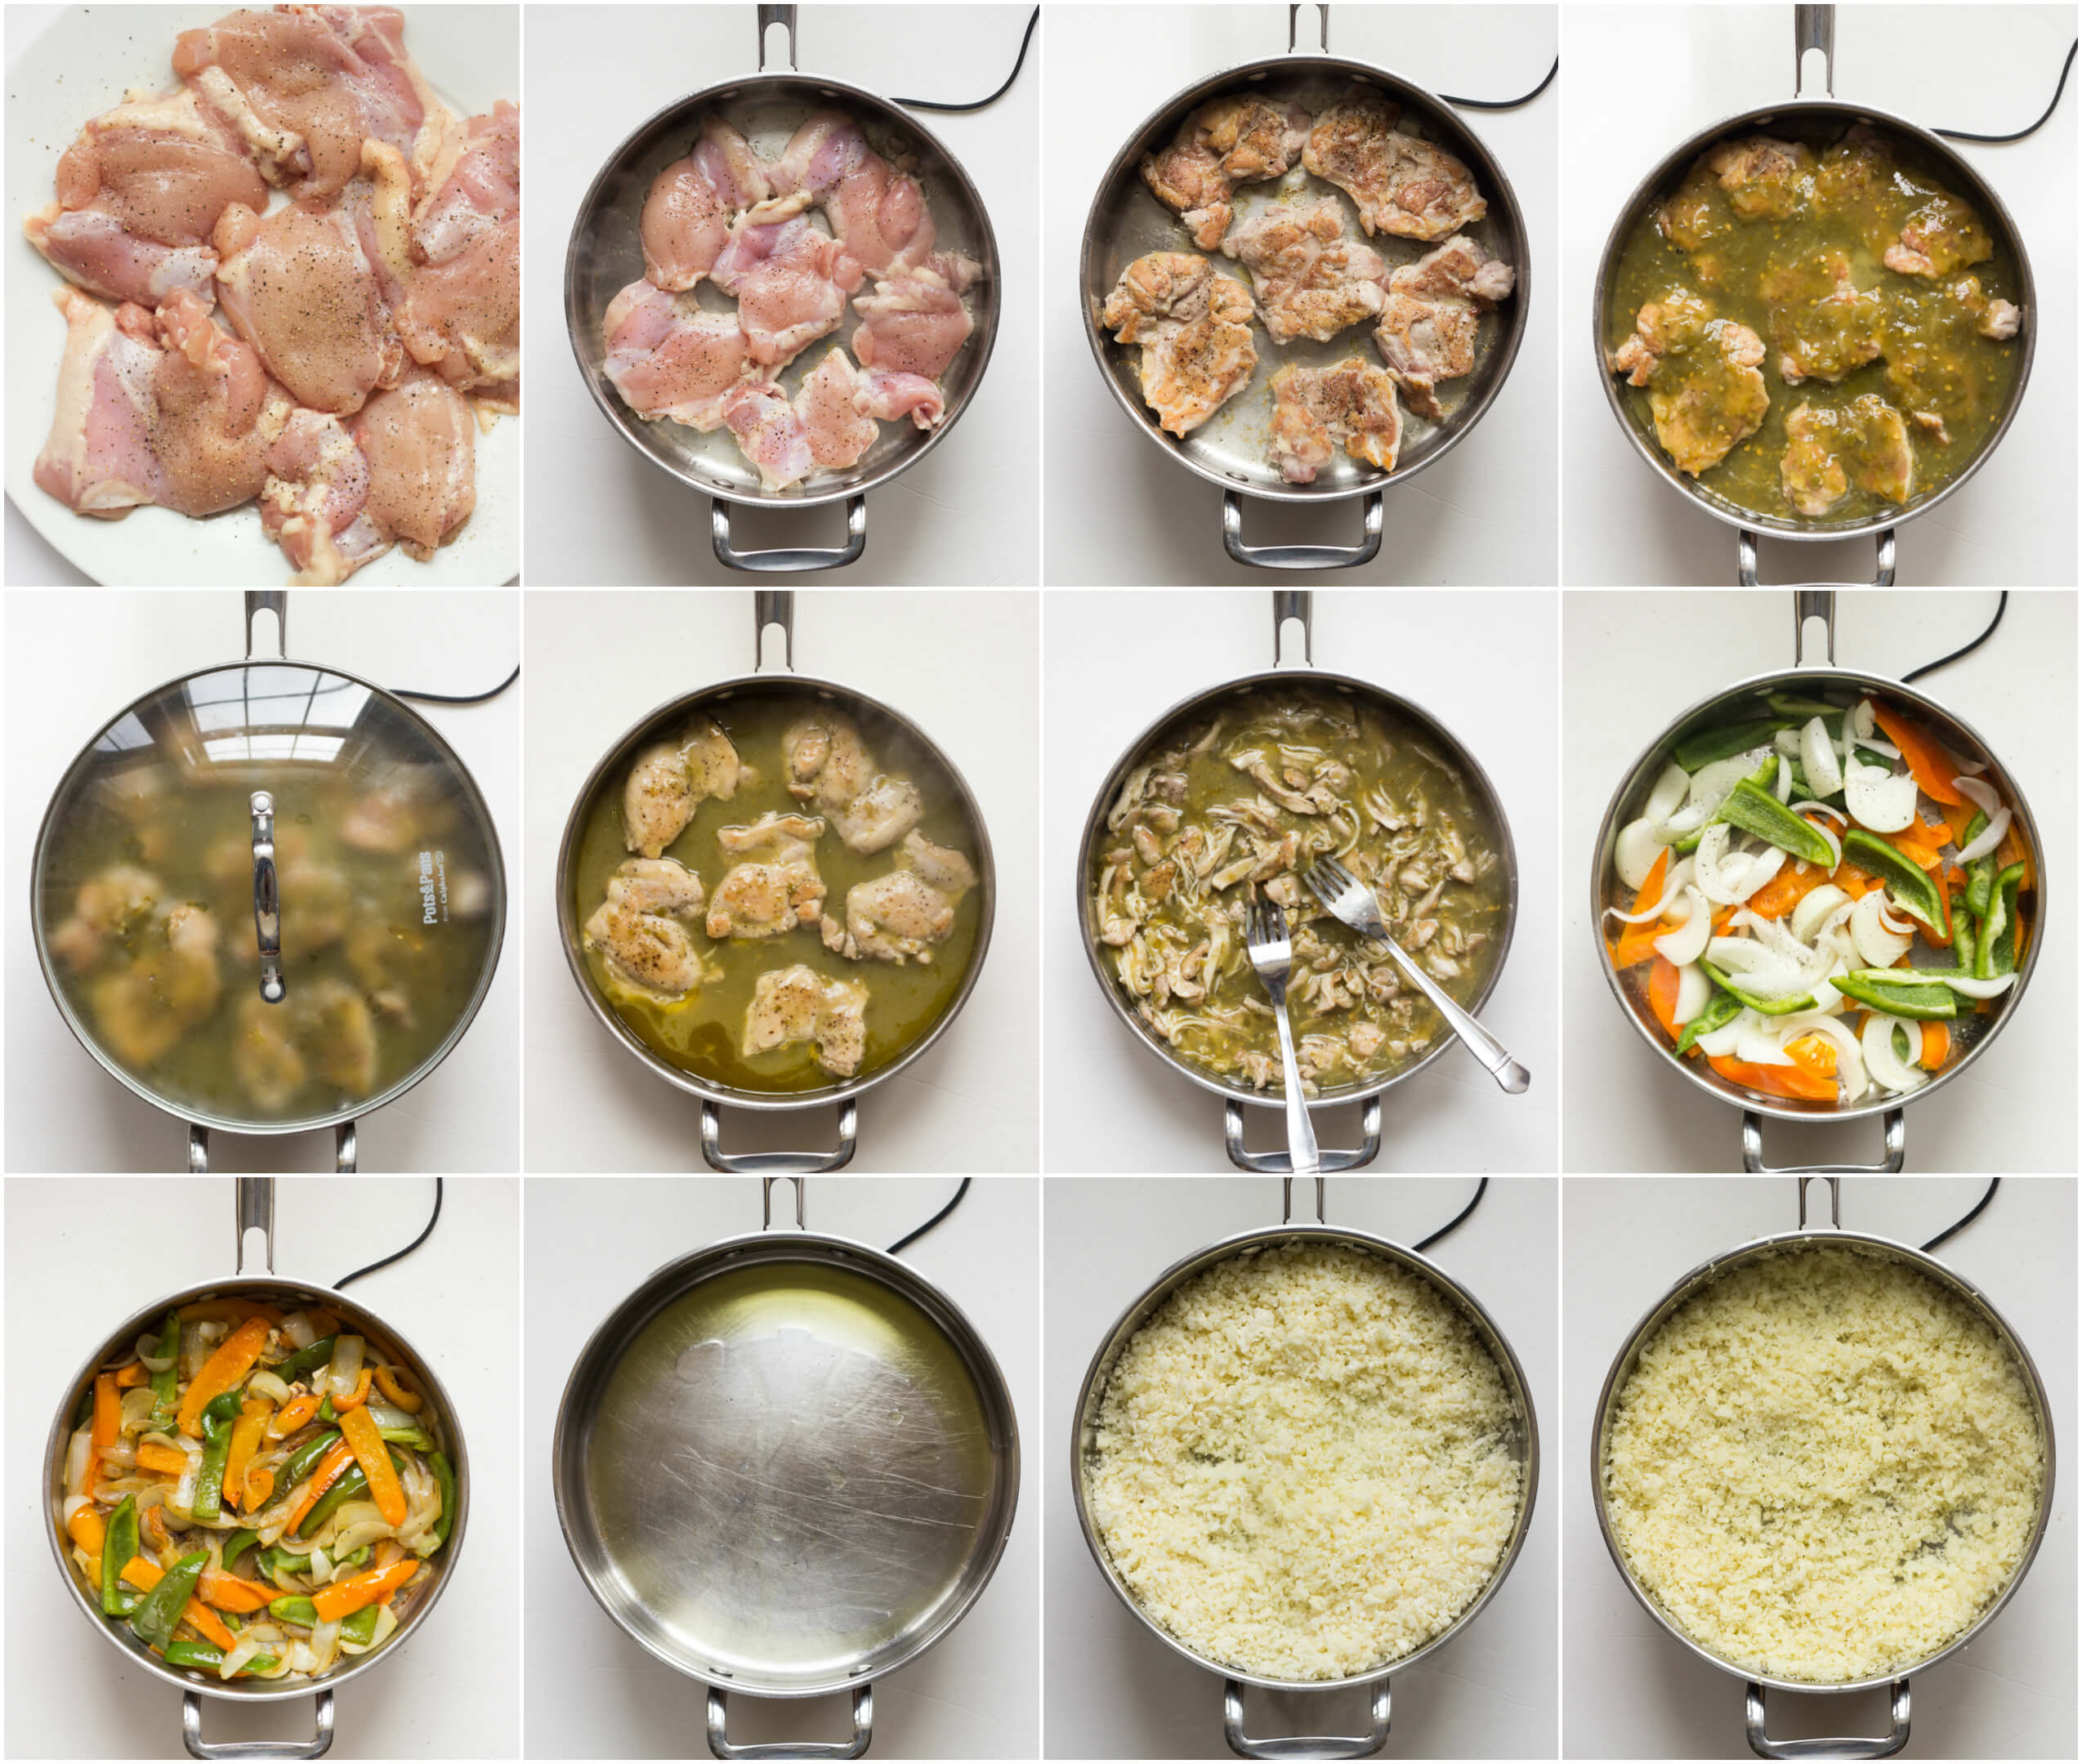 Easy Chicken Mexican Bowls (2 Ways!) - easy skillet shredded chicken served over cauliflower rice or white rice. Choice is yours.   littlebroken.com @littlebroken